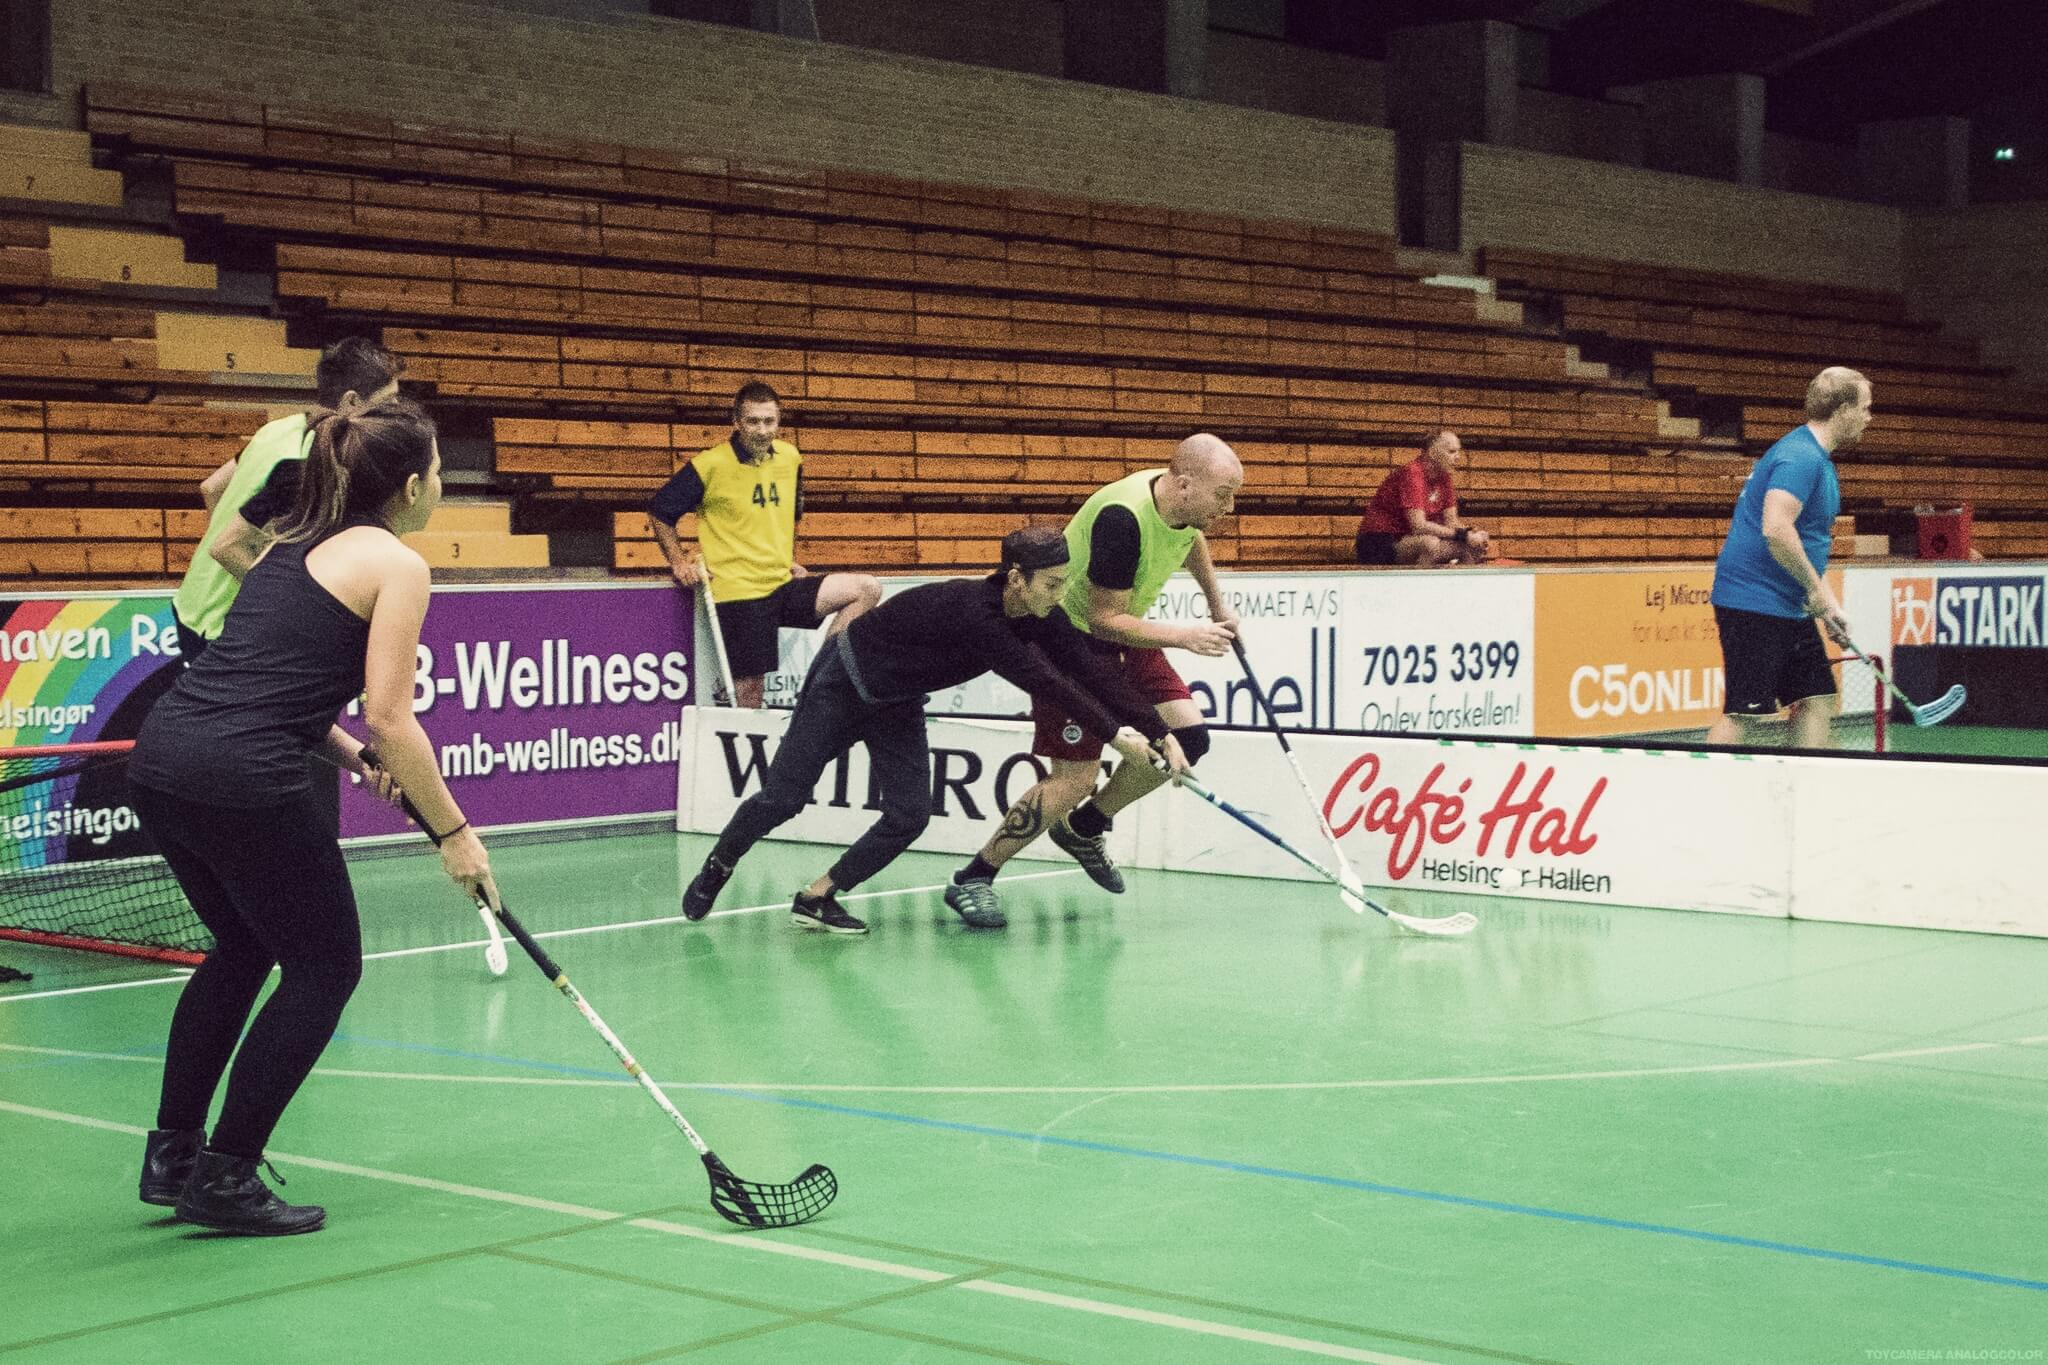 Folk High School Sport at International People's College in Denmark